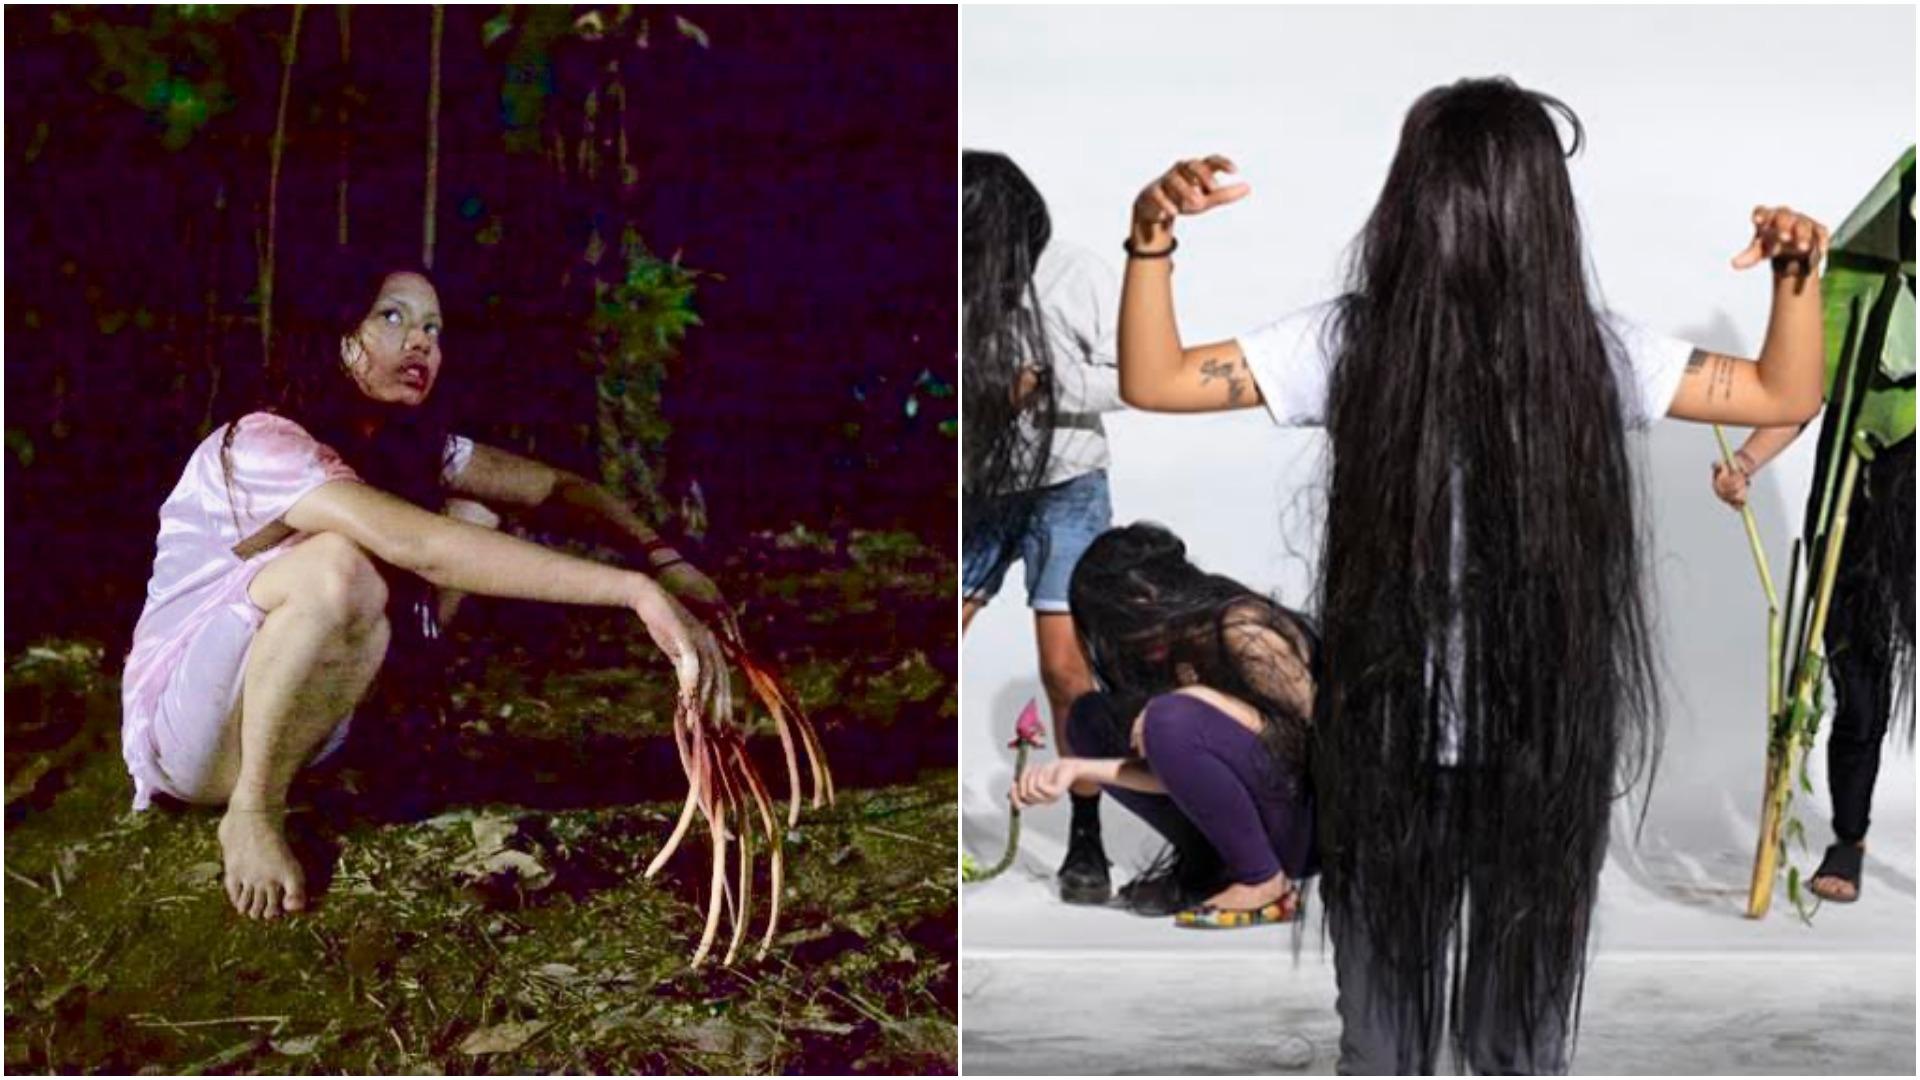 vice.com - Nisa Kreems - Southeast Asia's Vengeful Man-Eating Spirit Is a Feminist Icon